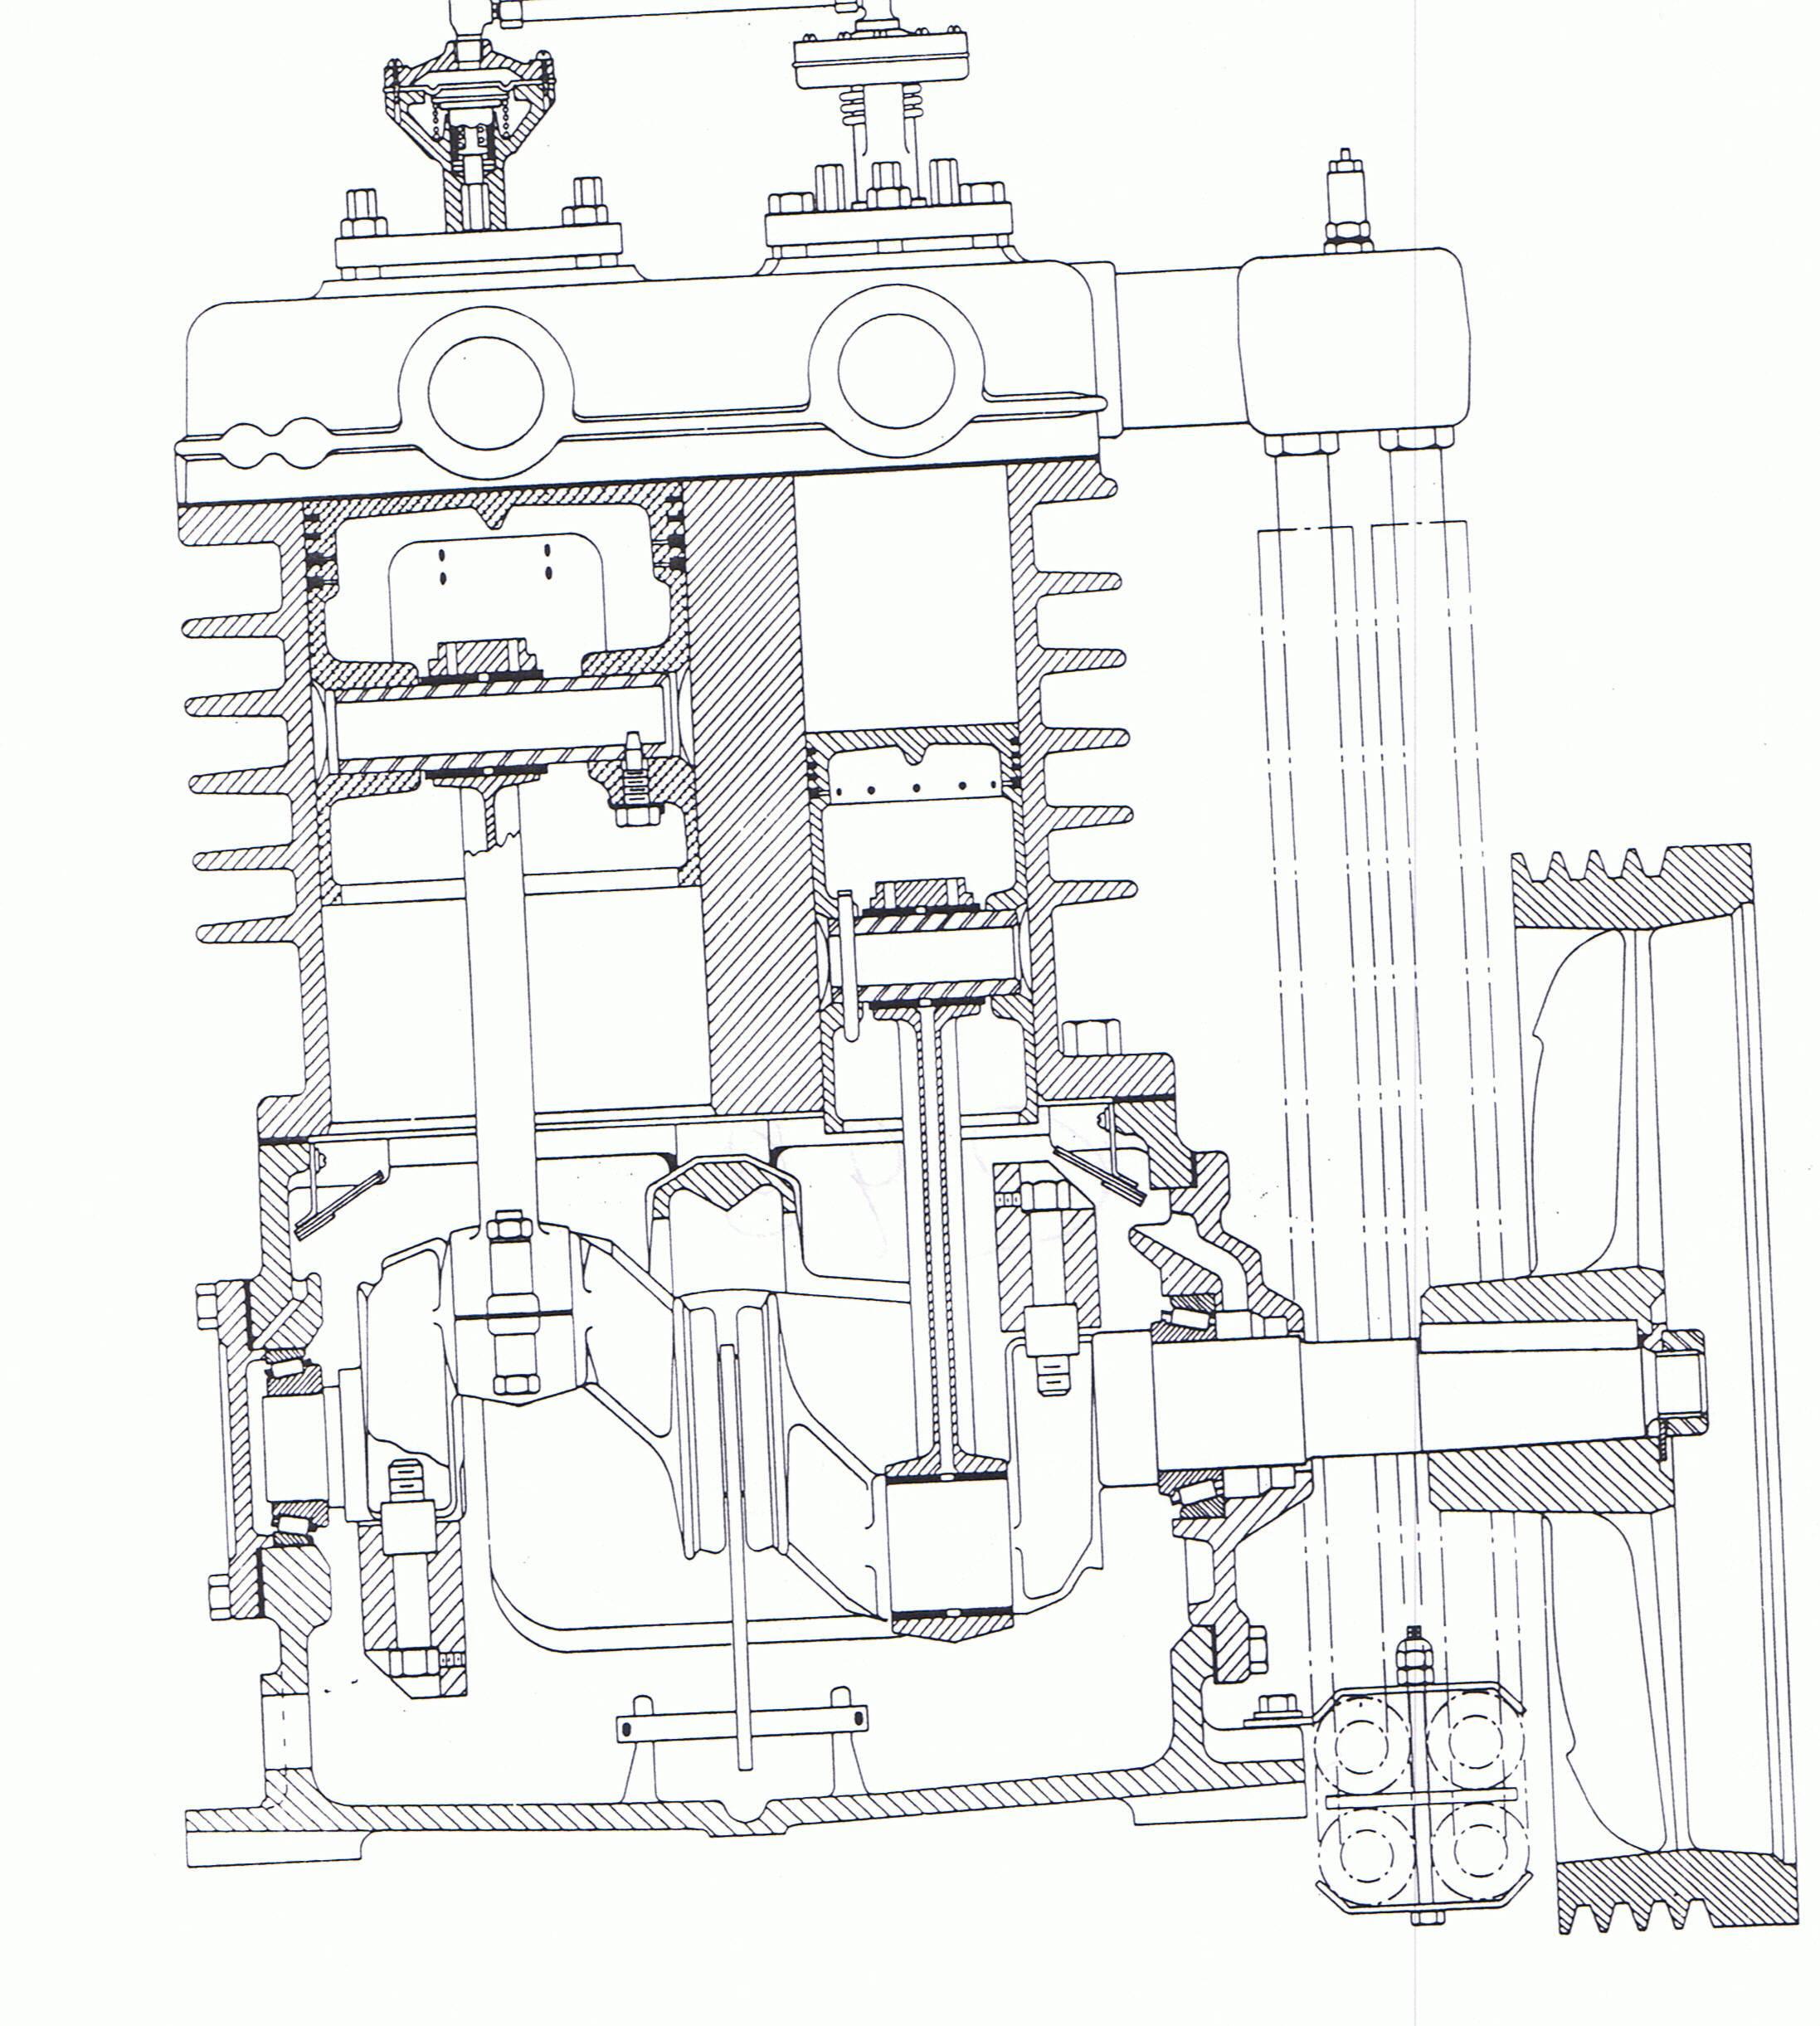 Central Pneumatic Compressor Switch Wiring Diagram